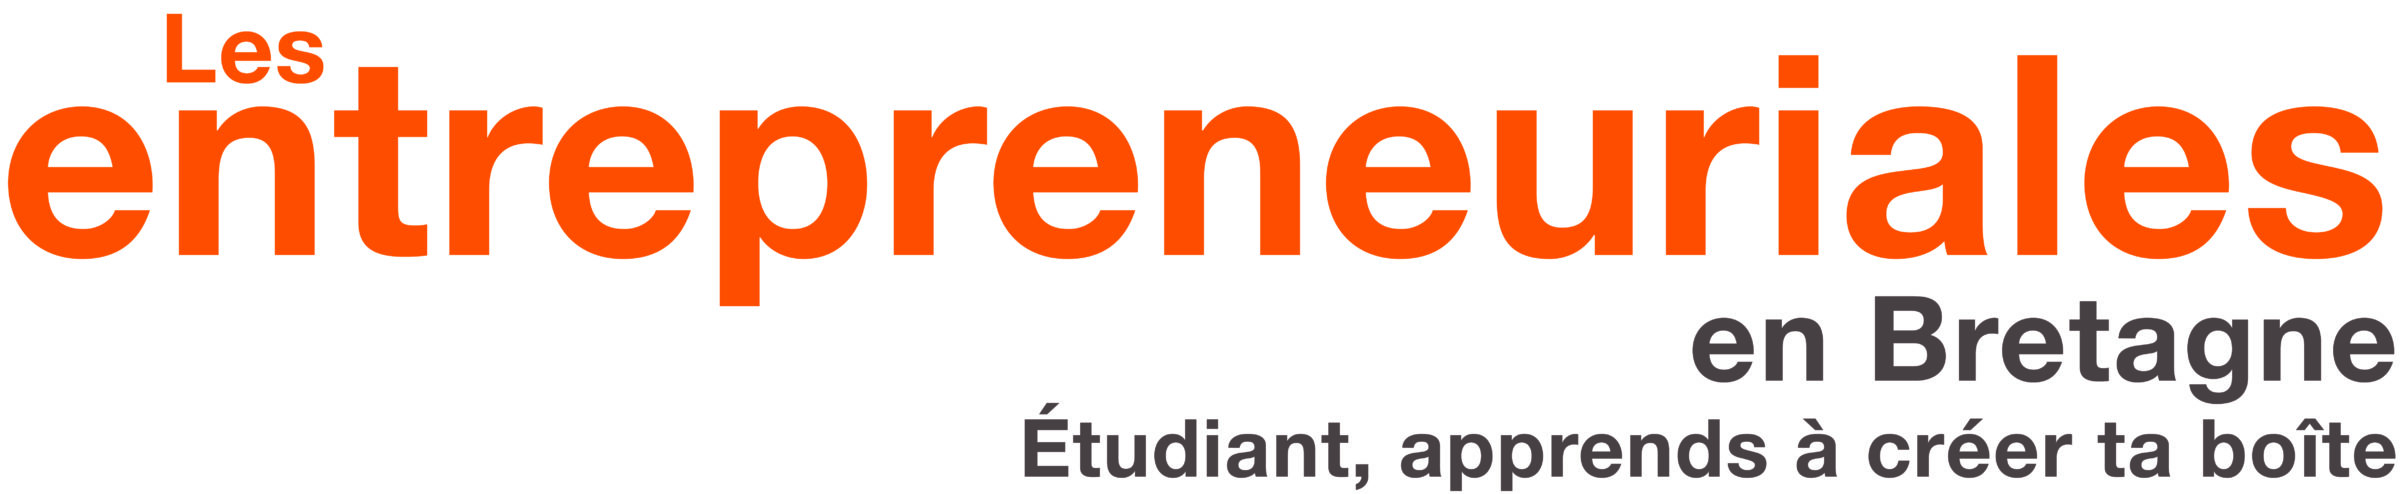 les entrepreneuriales Bretagne